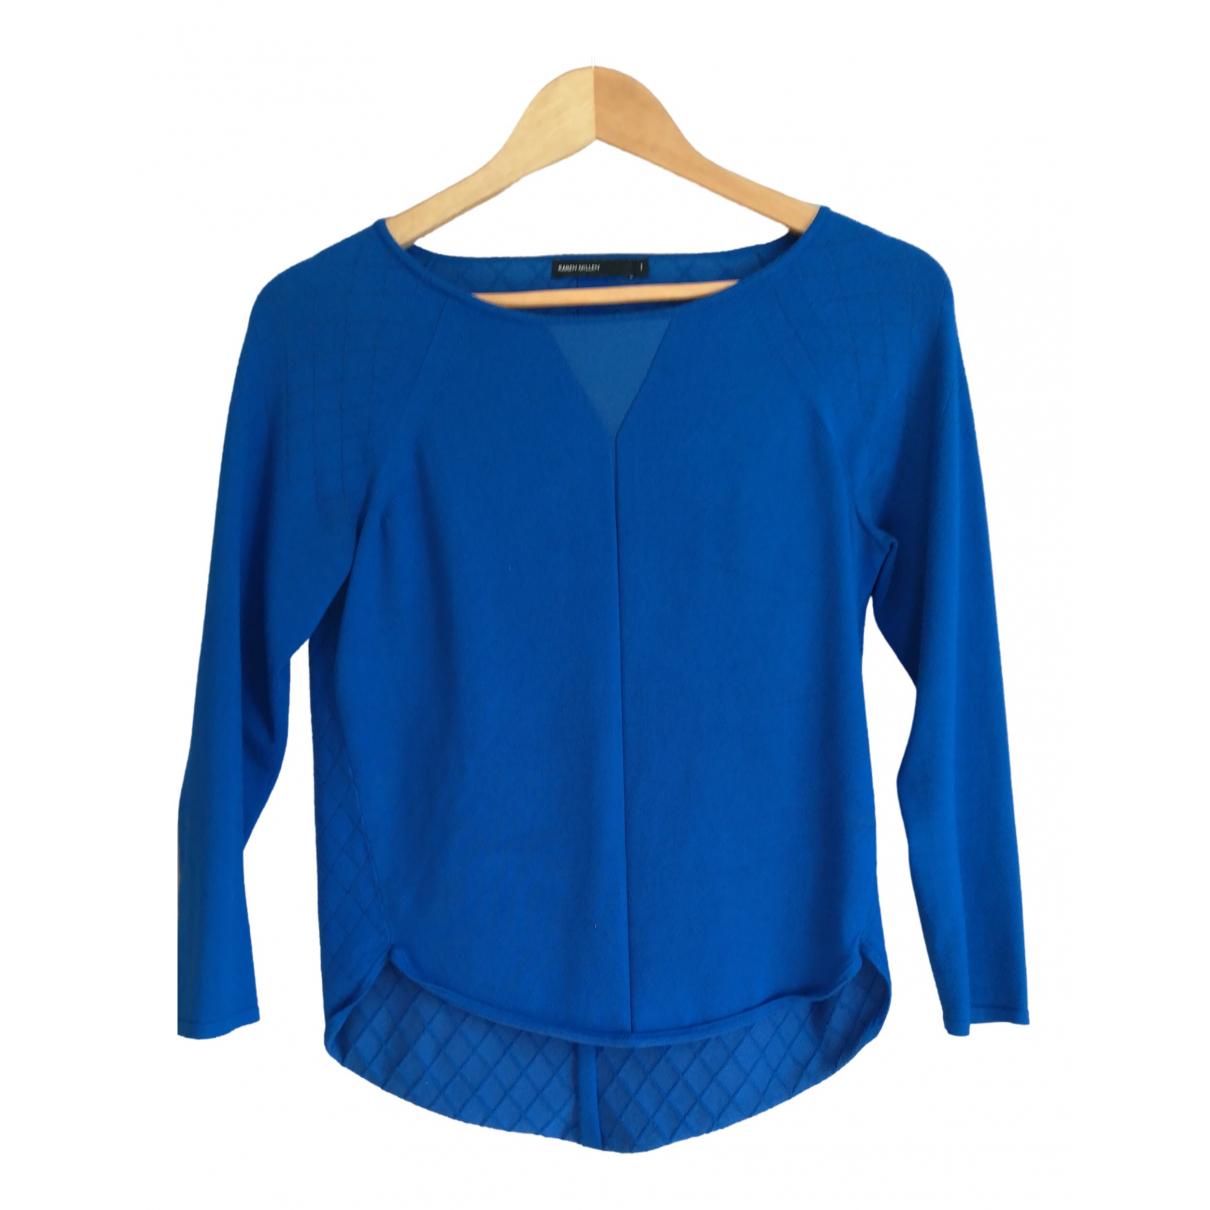 Karen Millen \N Blue Cotton Knitwear for Women 1 0-5